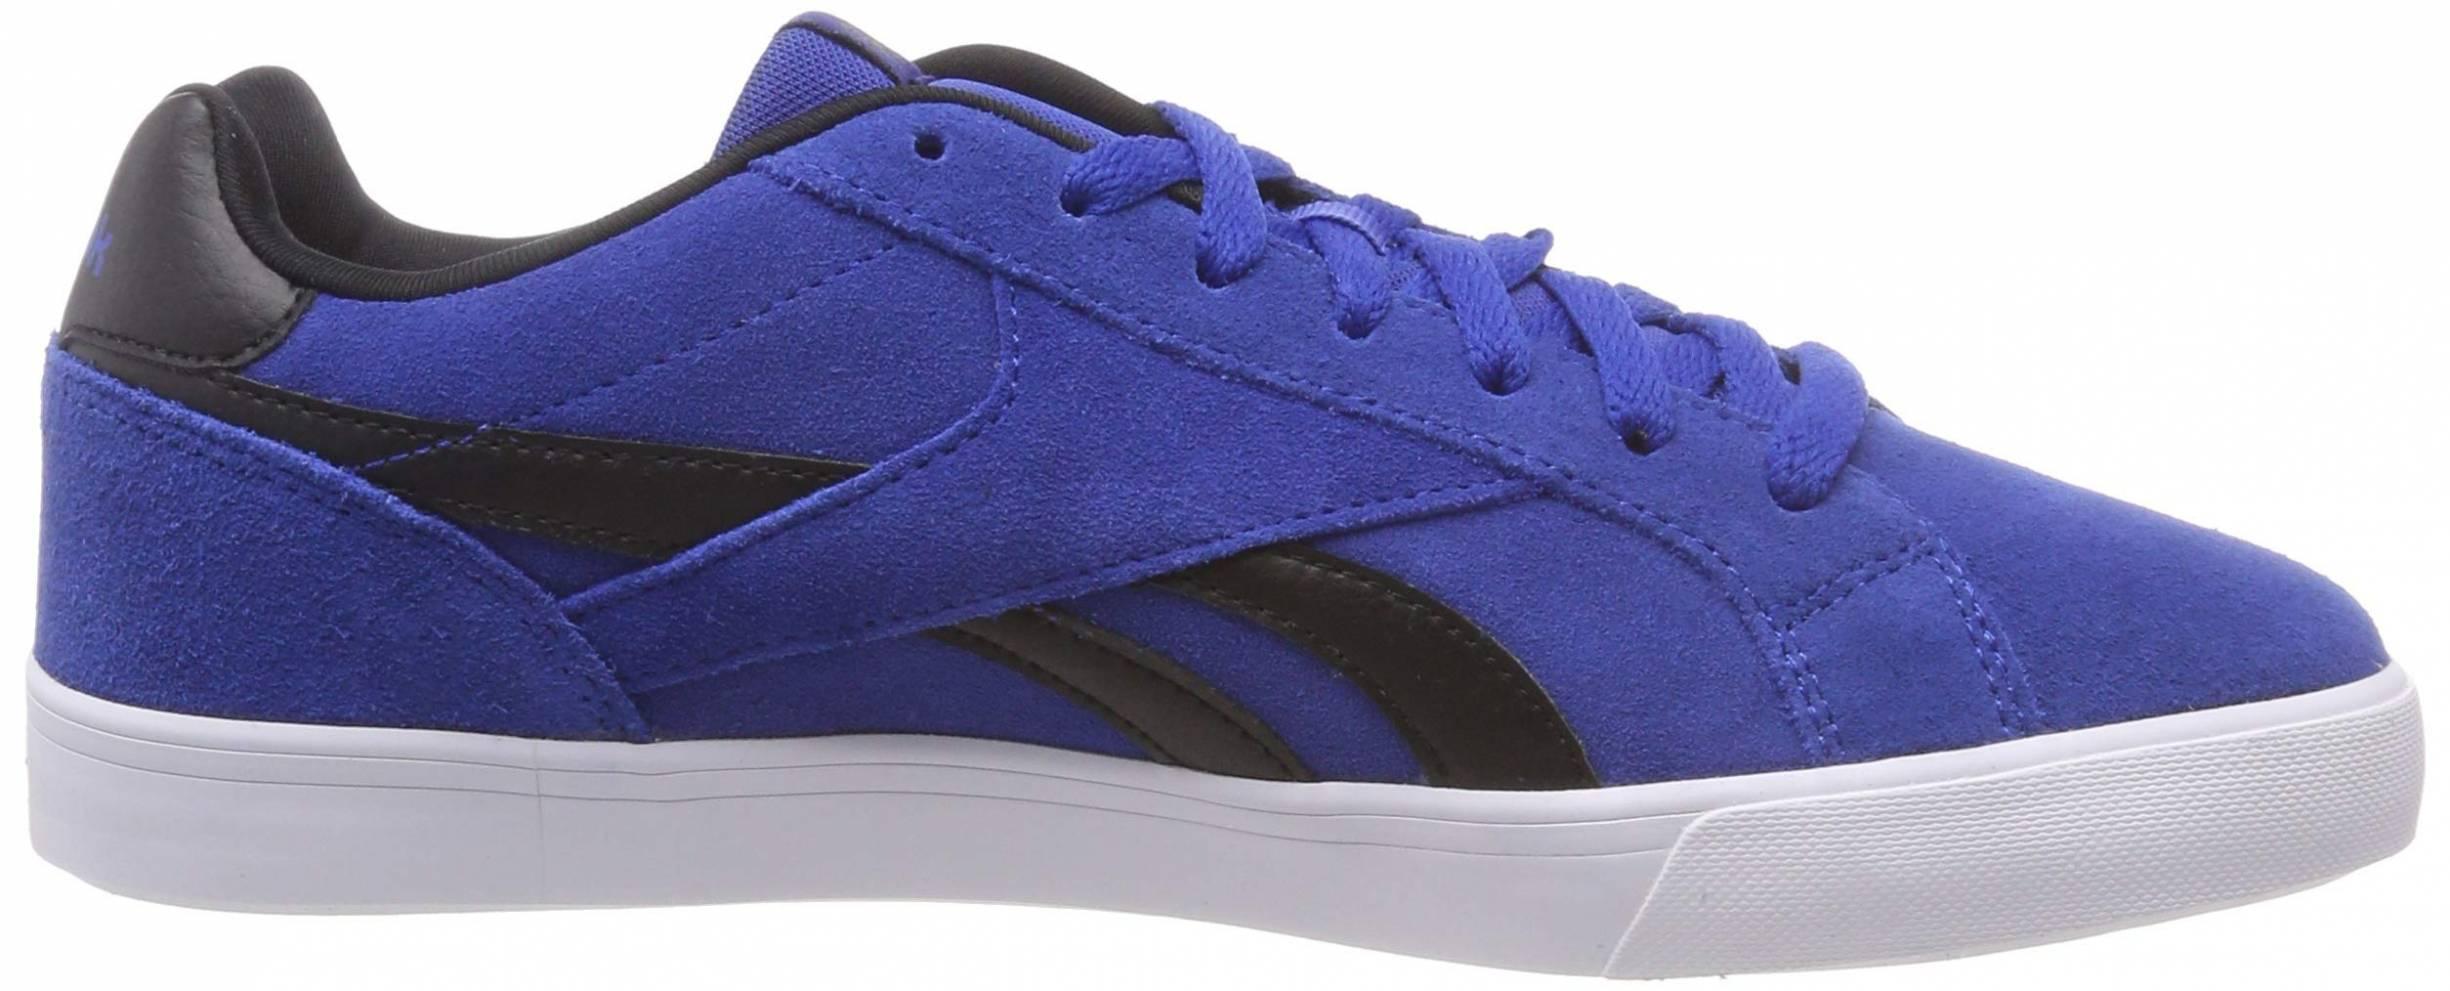 Reebok Royal Complete CLN Chaussures de Fitness Homme